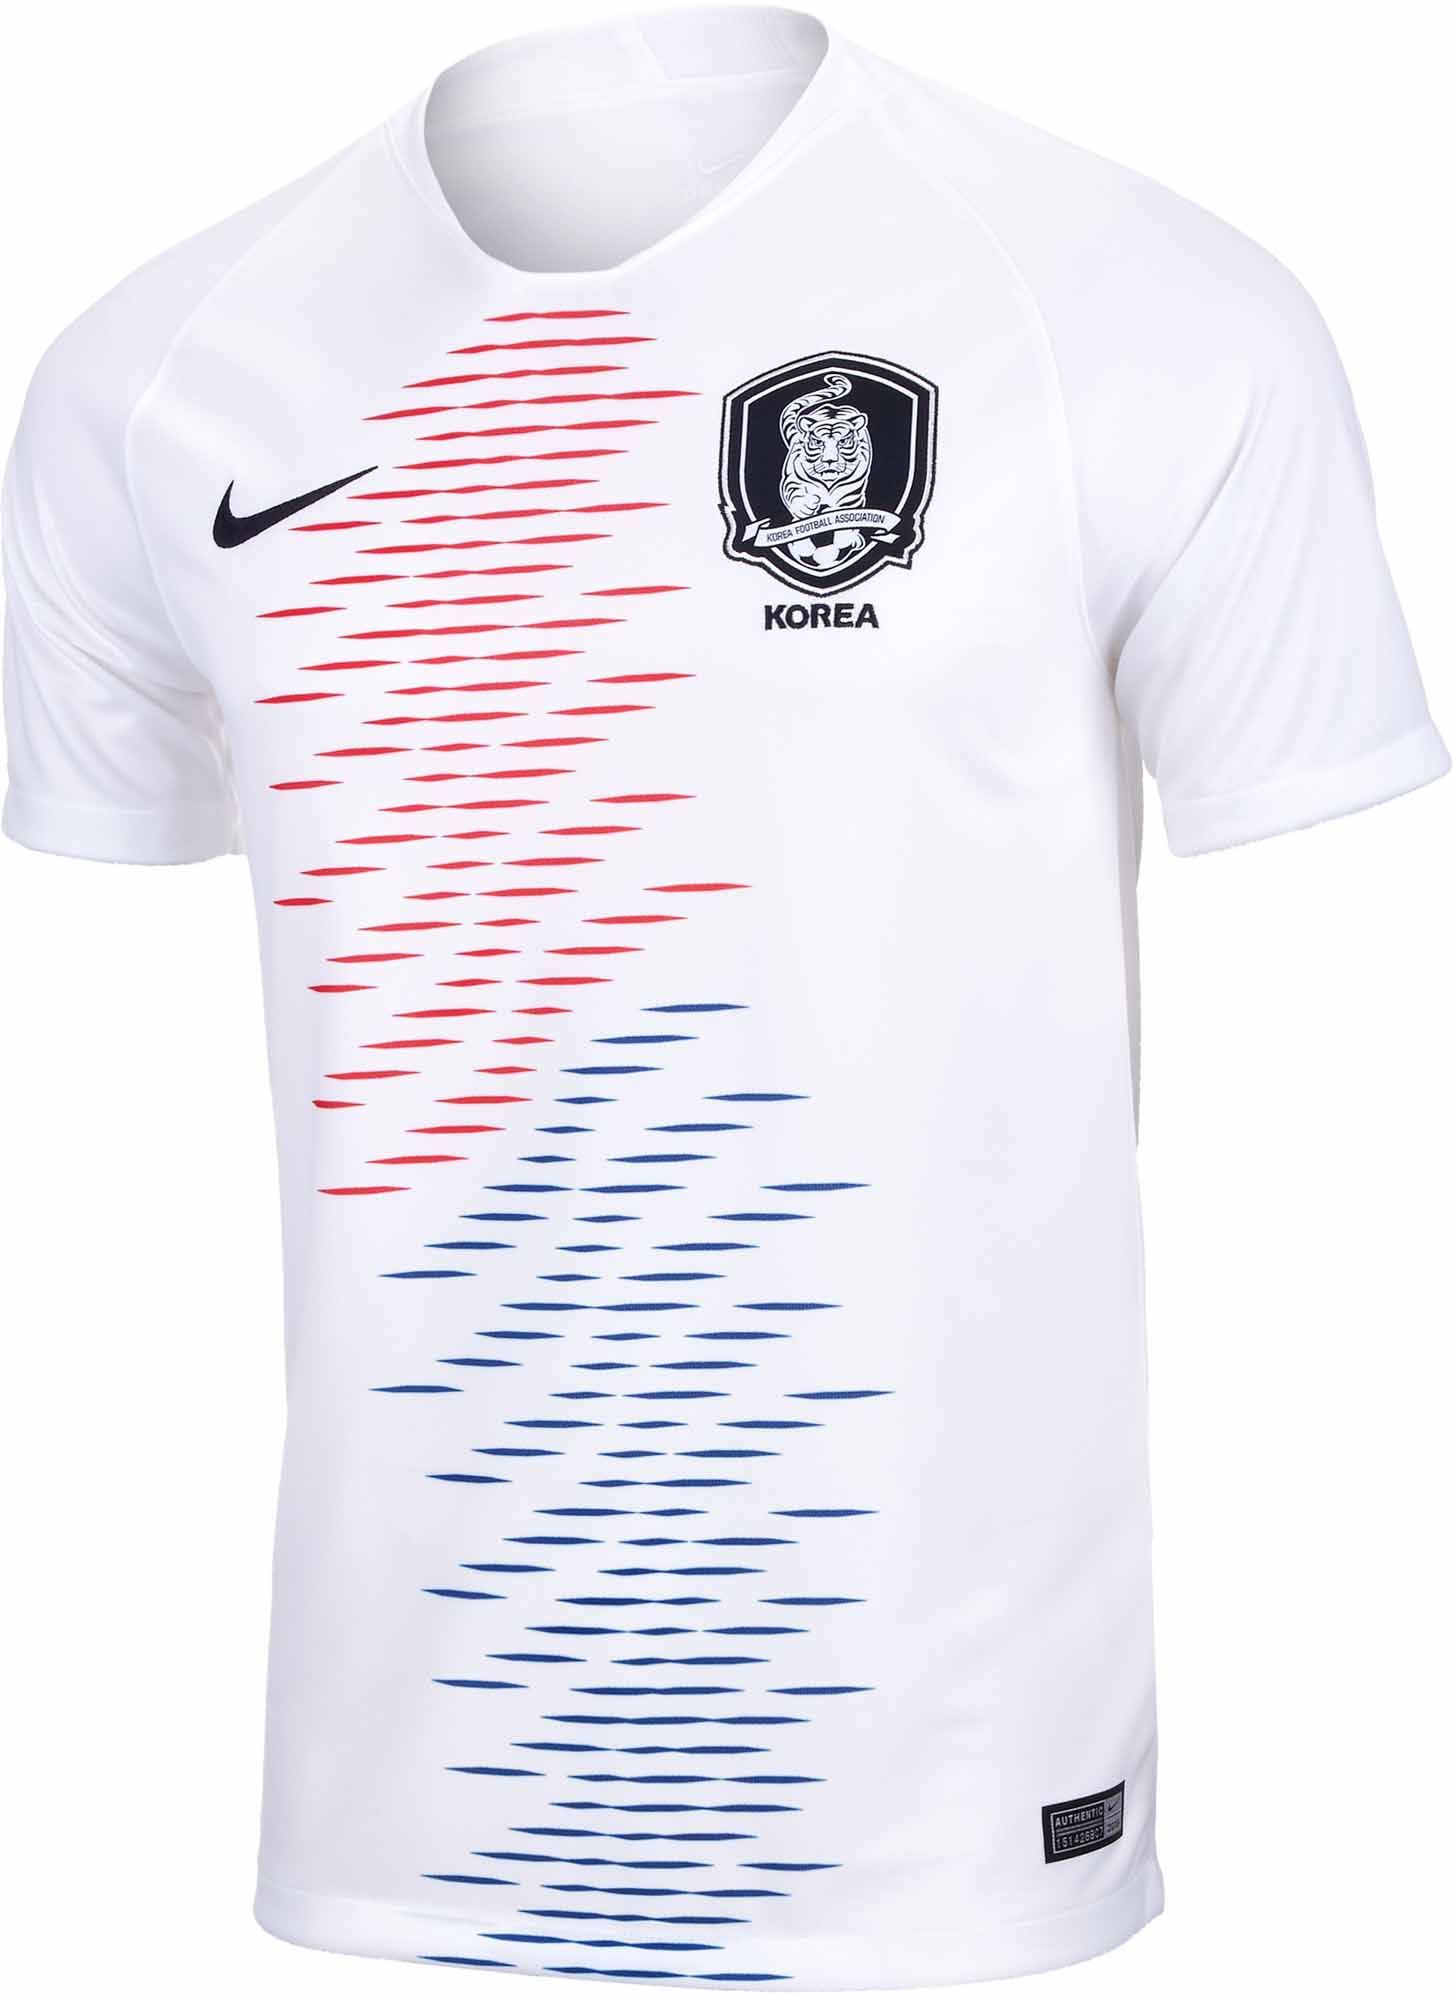 Nike South Korea Away Jersey 2018 19 Soccerpro Soccer Jersey Mens Soccer Jersey